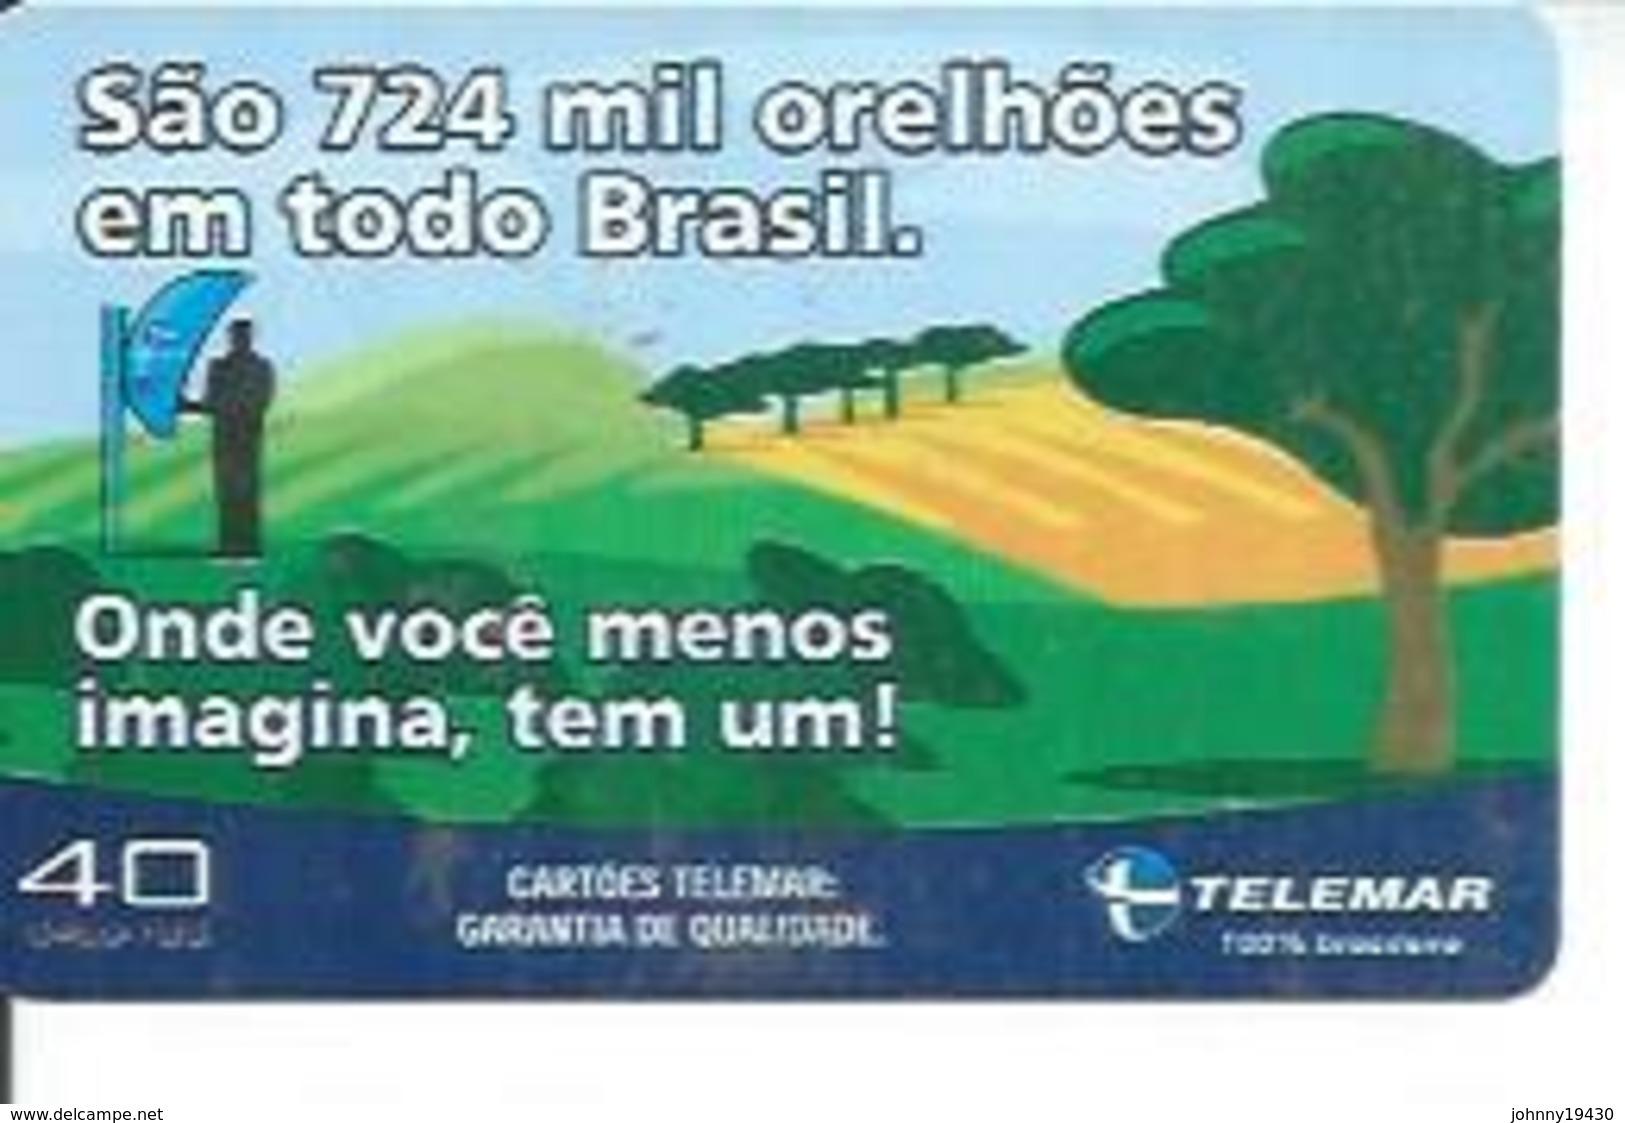 TELEMAR 40 - SAO 724 MIL ORELHOES EM TODO BRASIL   - BRESIL 02/2003 - Brésil